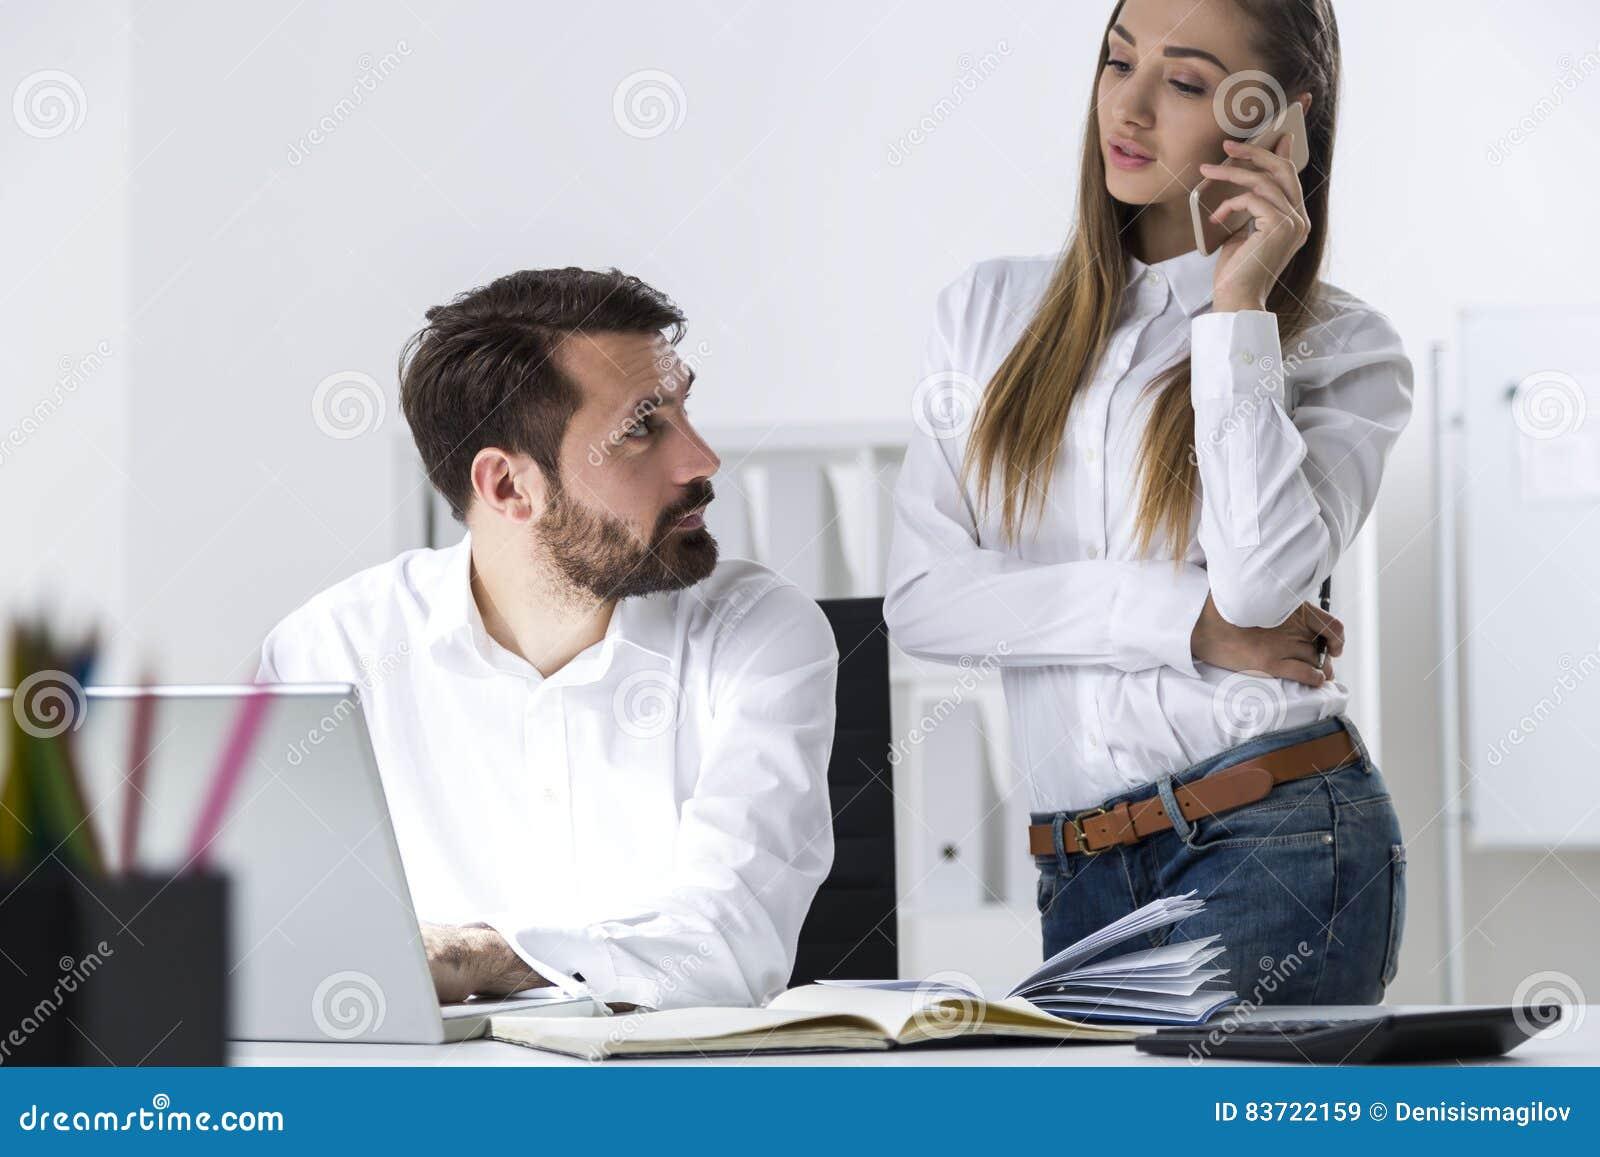 Working Secretary Selfie Desk Wwwmiifotoscom